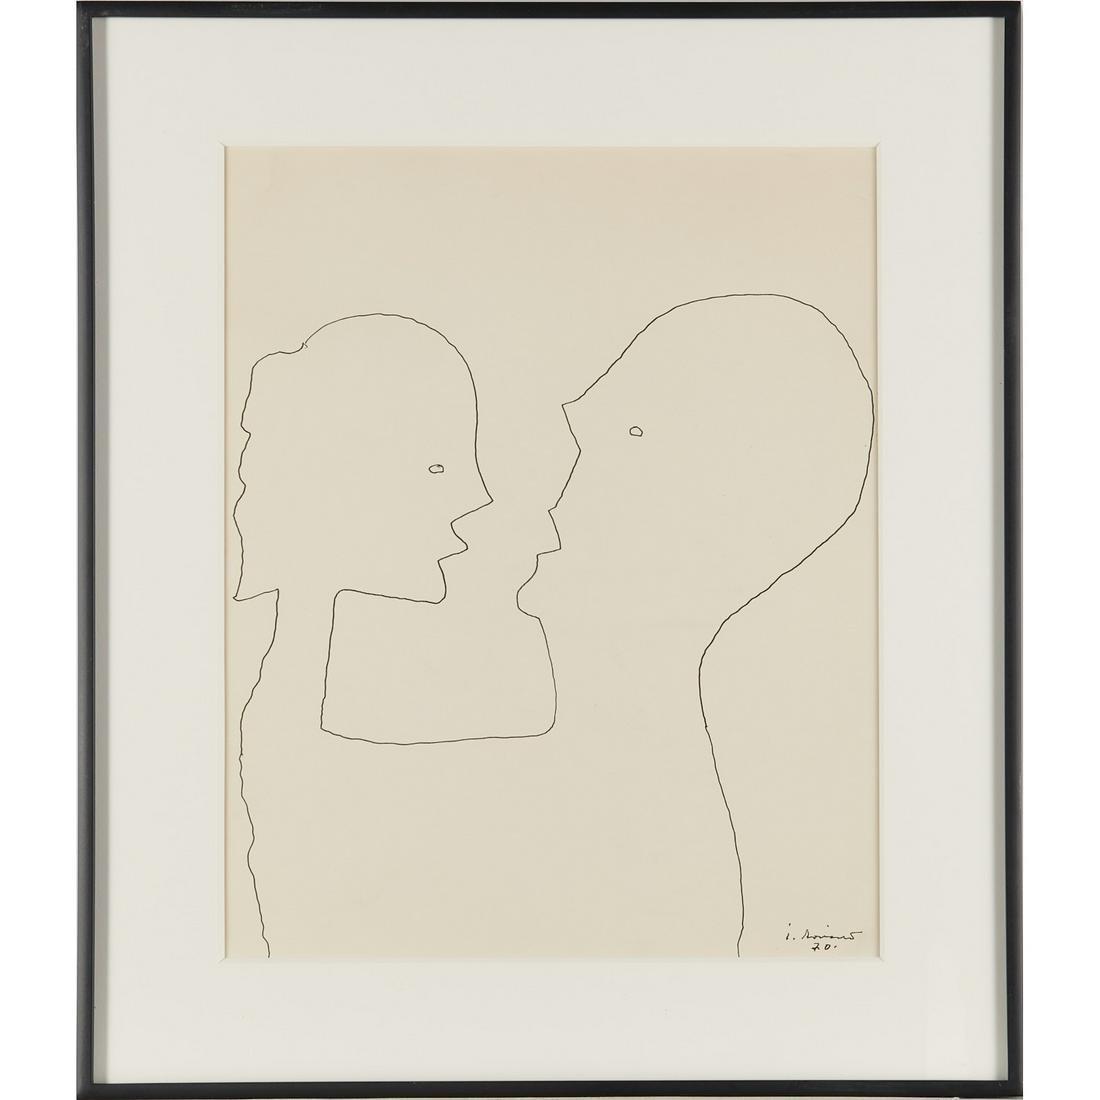 Juan Soriano, drawing, 1970